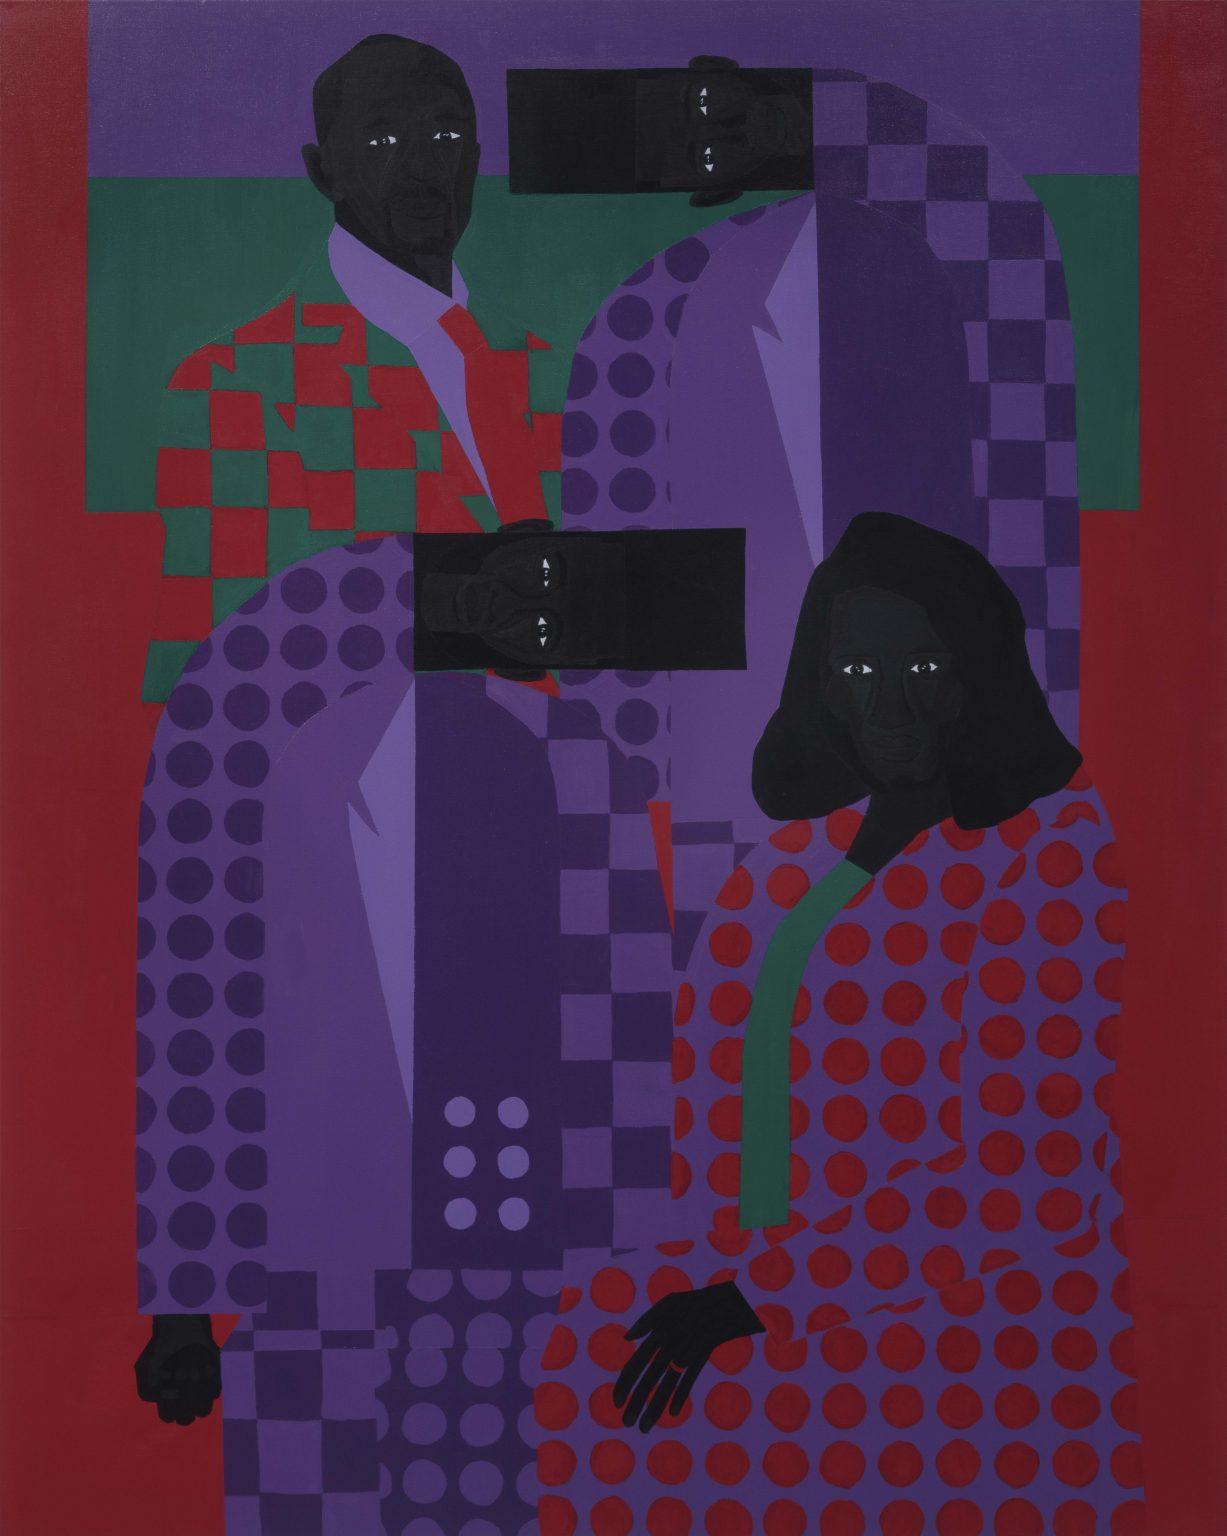 Jon Key. Family Portrait No. 6 (The Key Family). 2020. Acrylic on canvas. 60 x 48 inches (152.4 x 121.9 cm)   Steve Turner